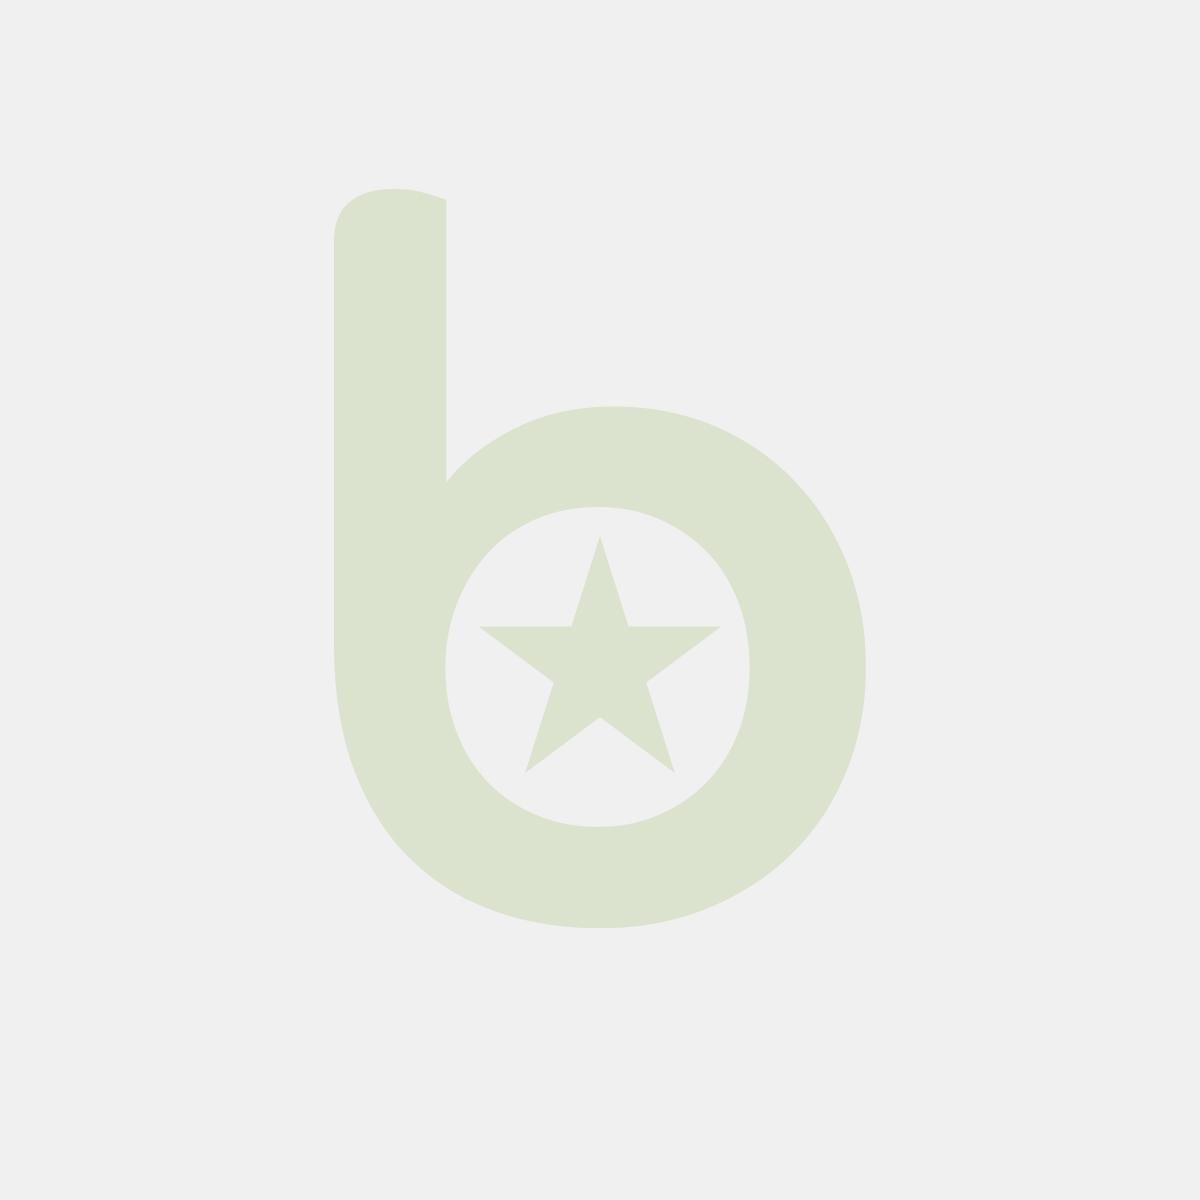 FINGERFOOD - pucharek PS biały 7x6cm op. 25 sztuk